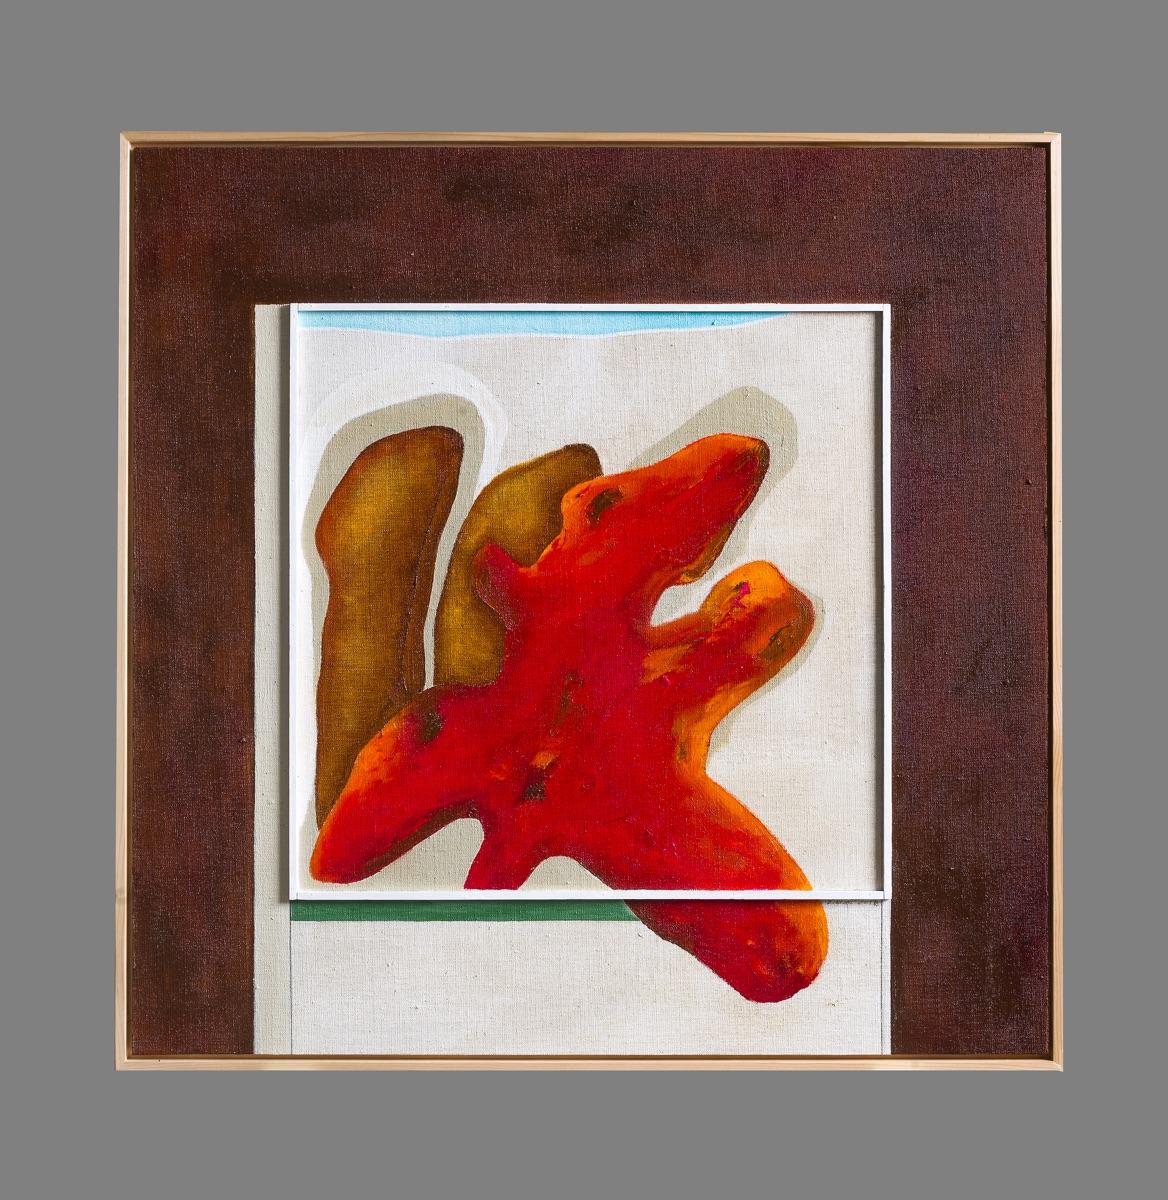 BOHUMIL ELIÁŠ ML. Domov červené, 80x80cm, 2018, olej na plátně